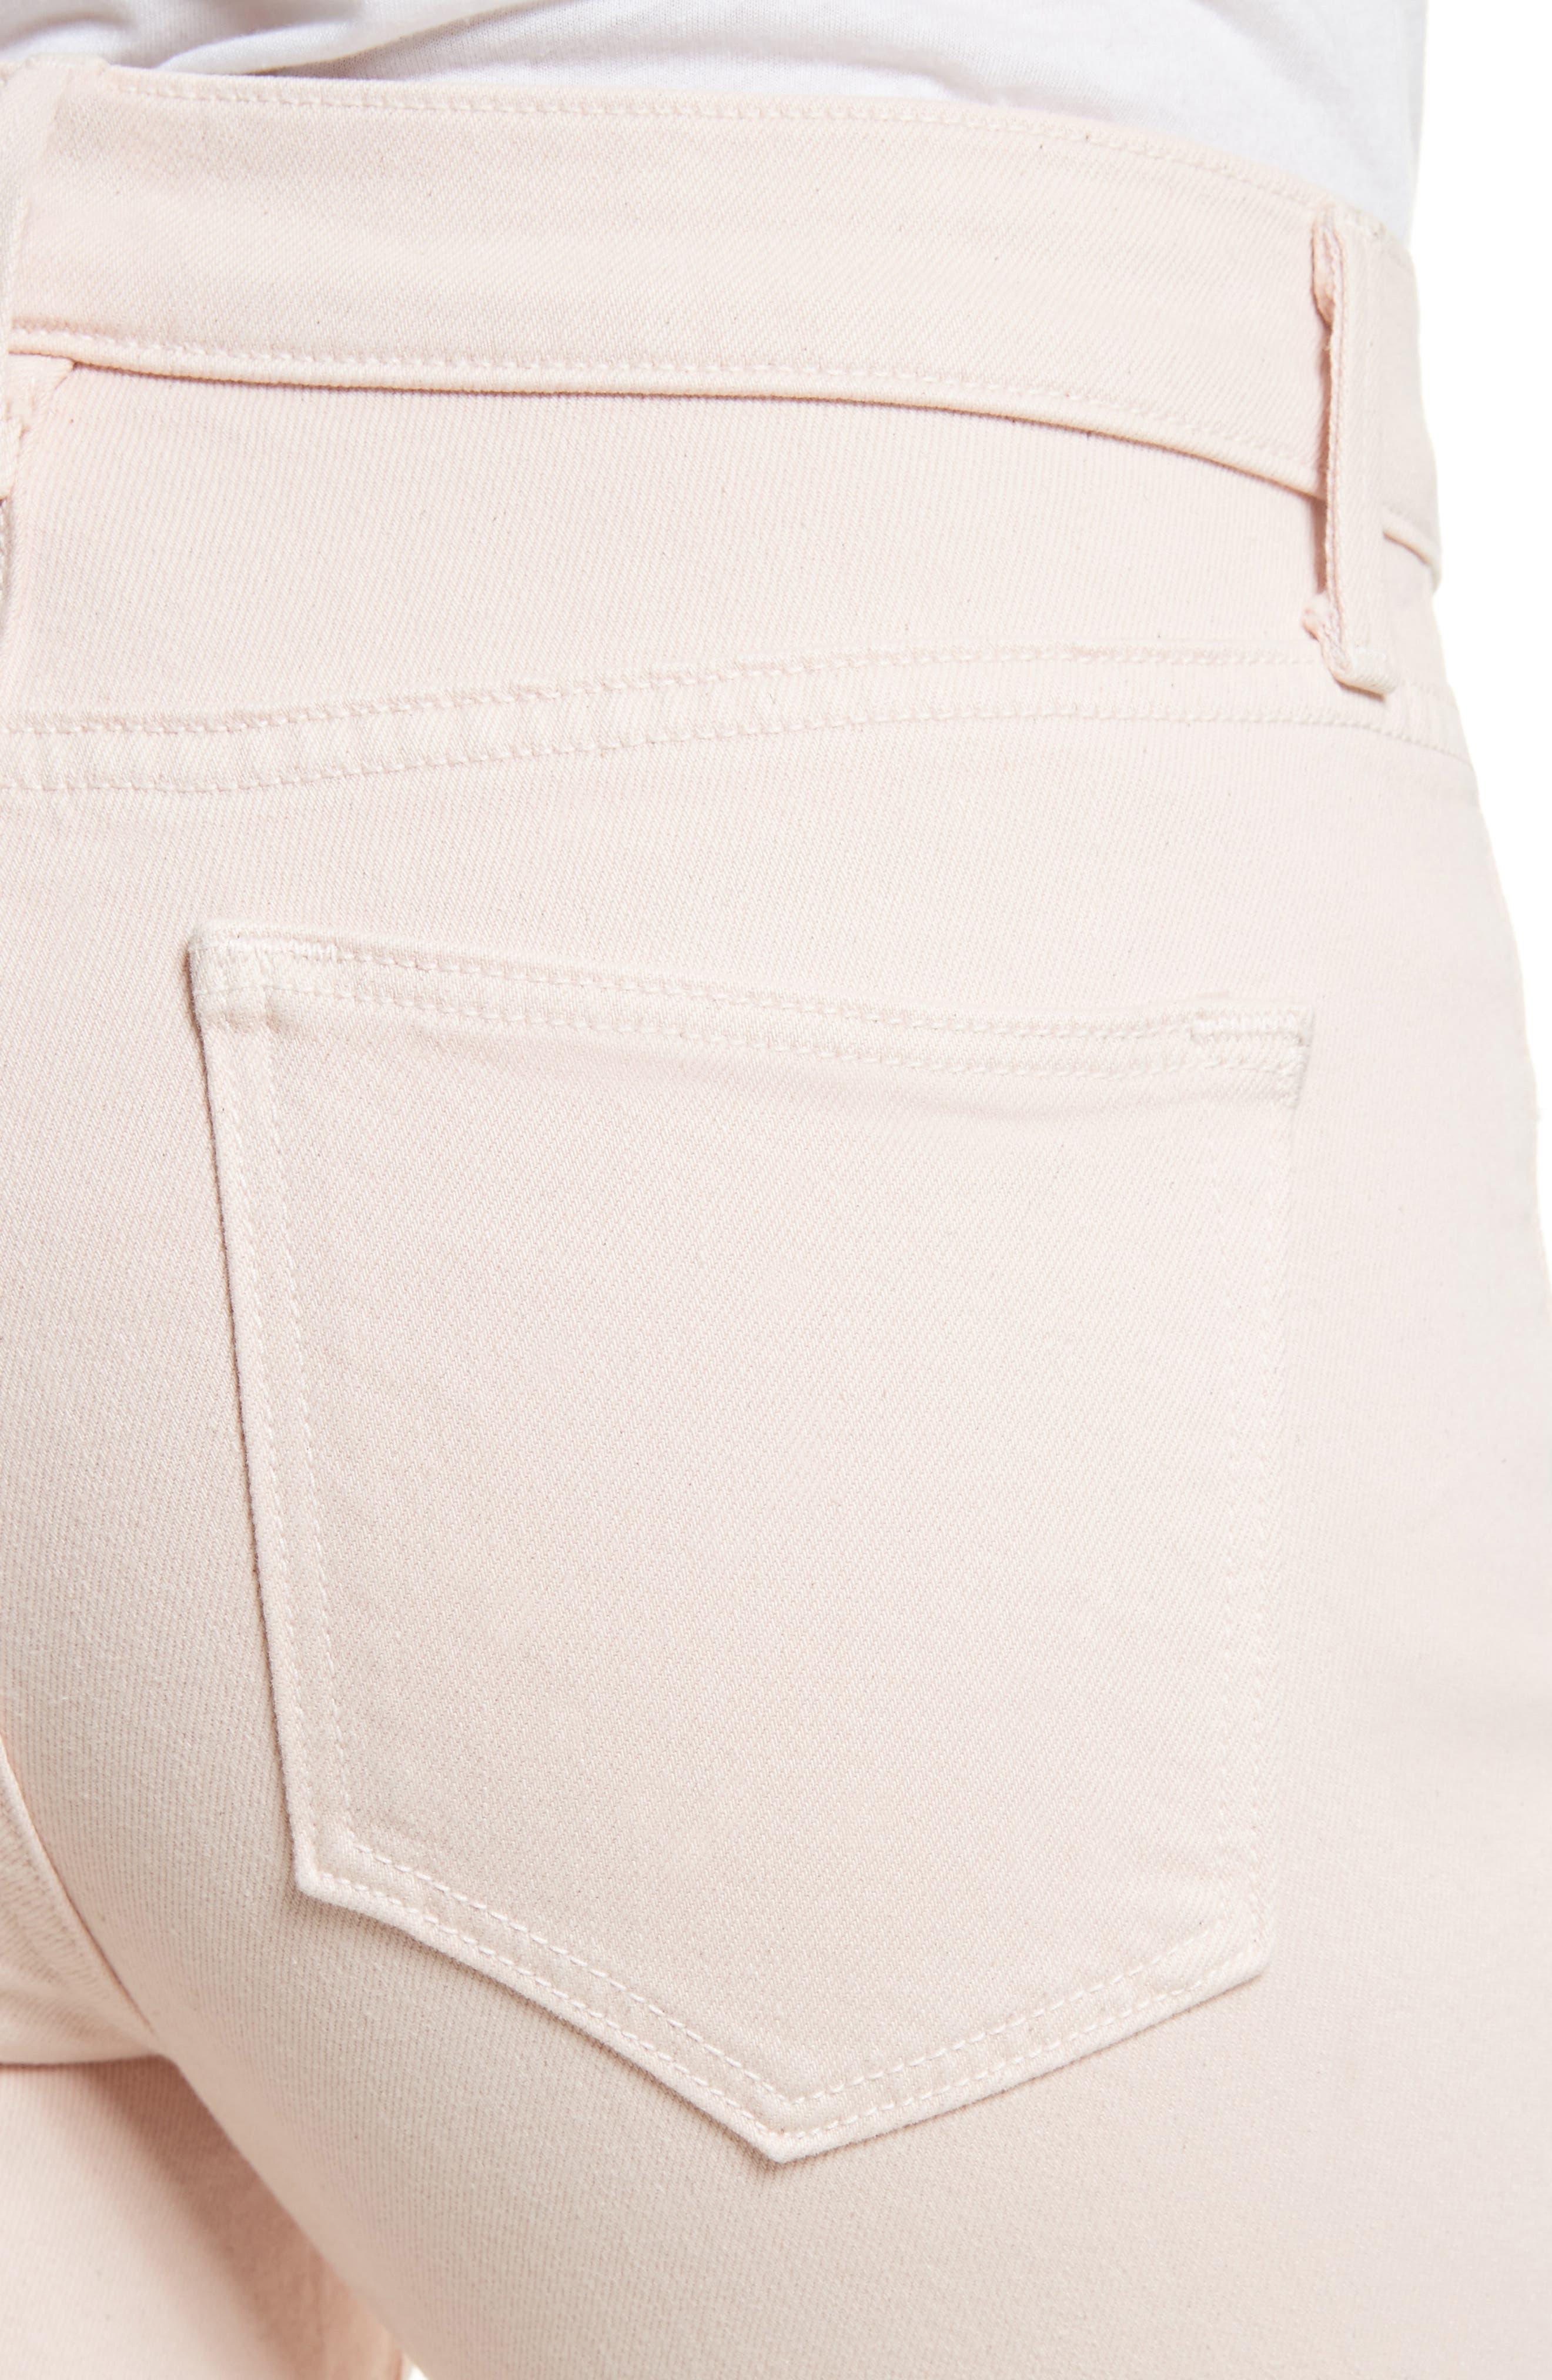 Skinny Crop Jeans,                             Alternate thumbnail 16, color,